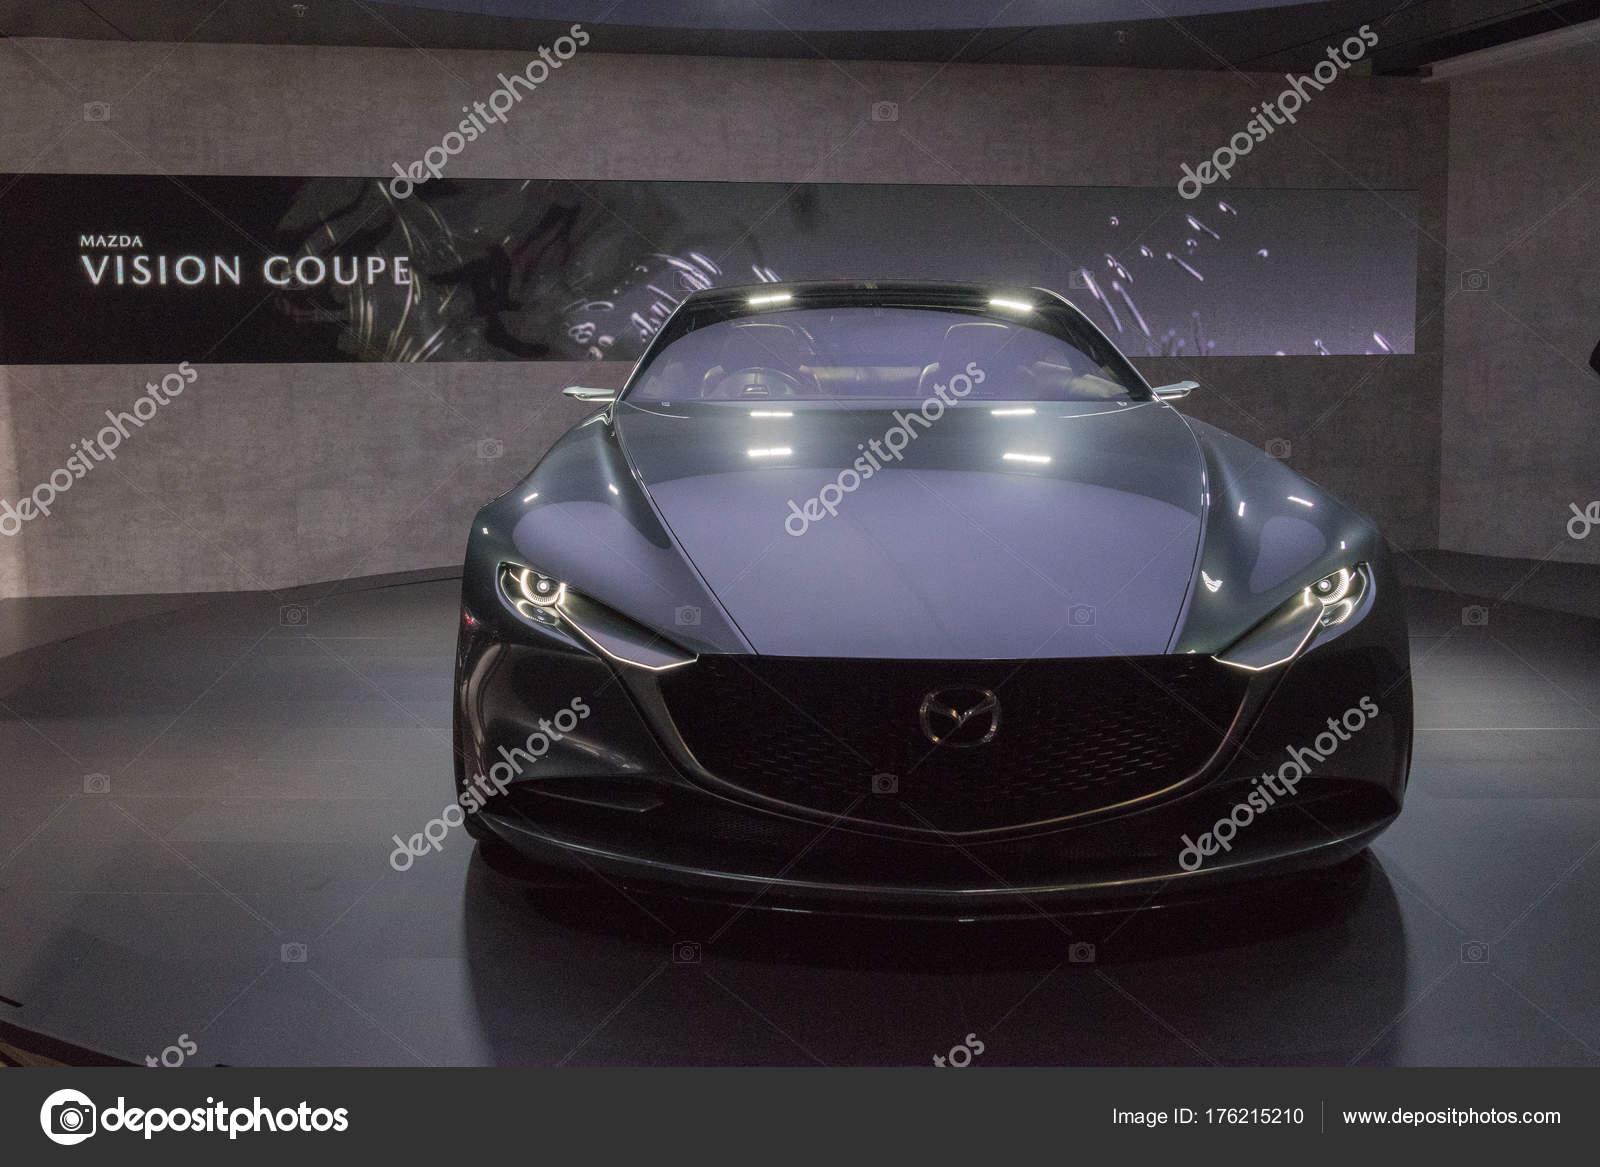 https://st3.depositphotos.com/1955233/17621/i/1600/depositphotos_176215210-stock-photo-mazda-vision-coupe-concept-on.jpg